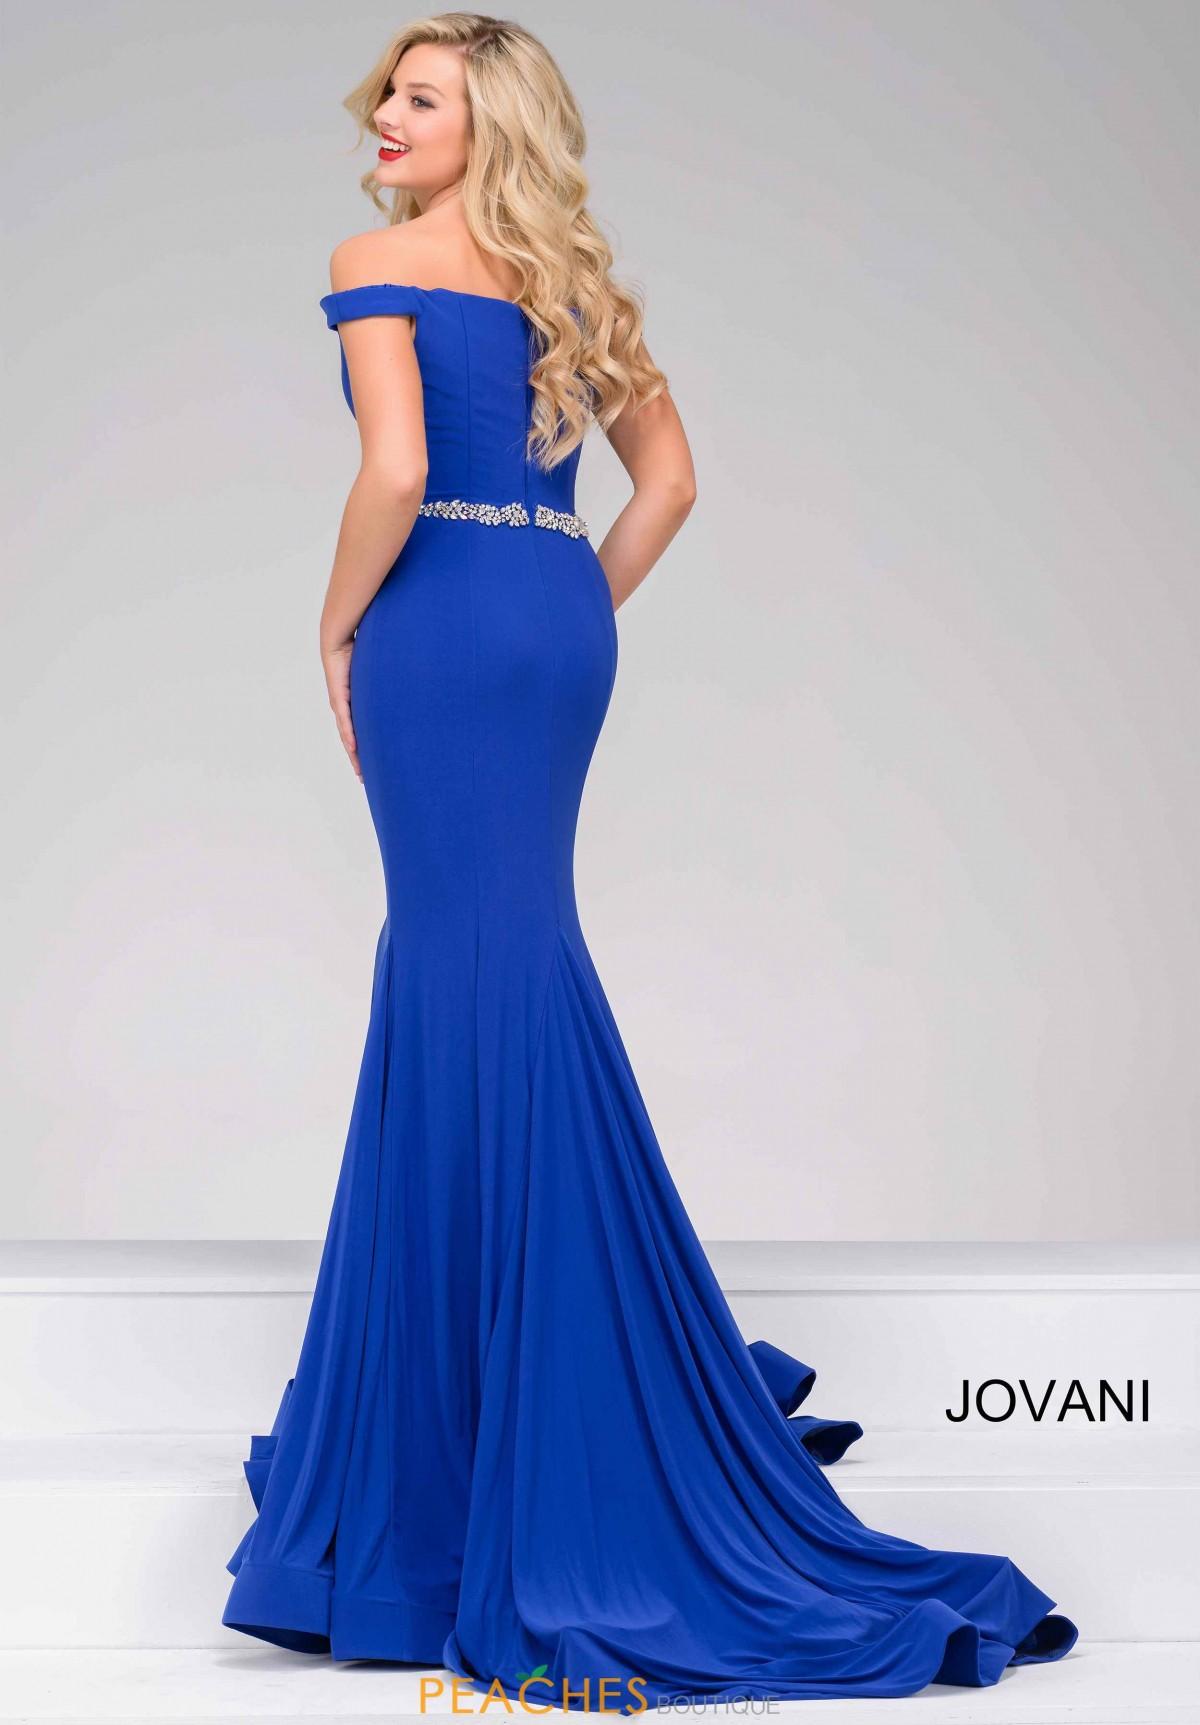 Jovani  Royal Blue beaded belt fitted 49254